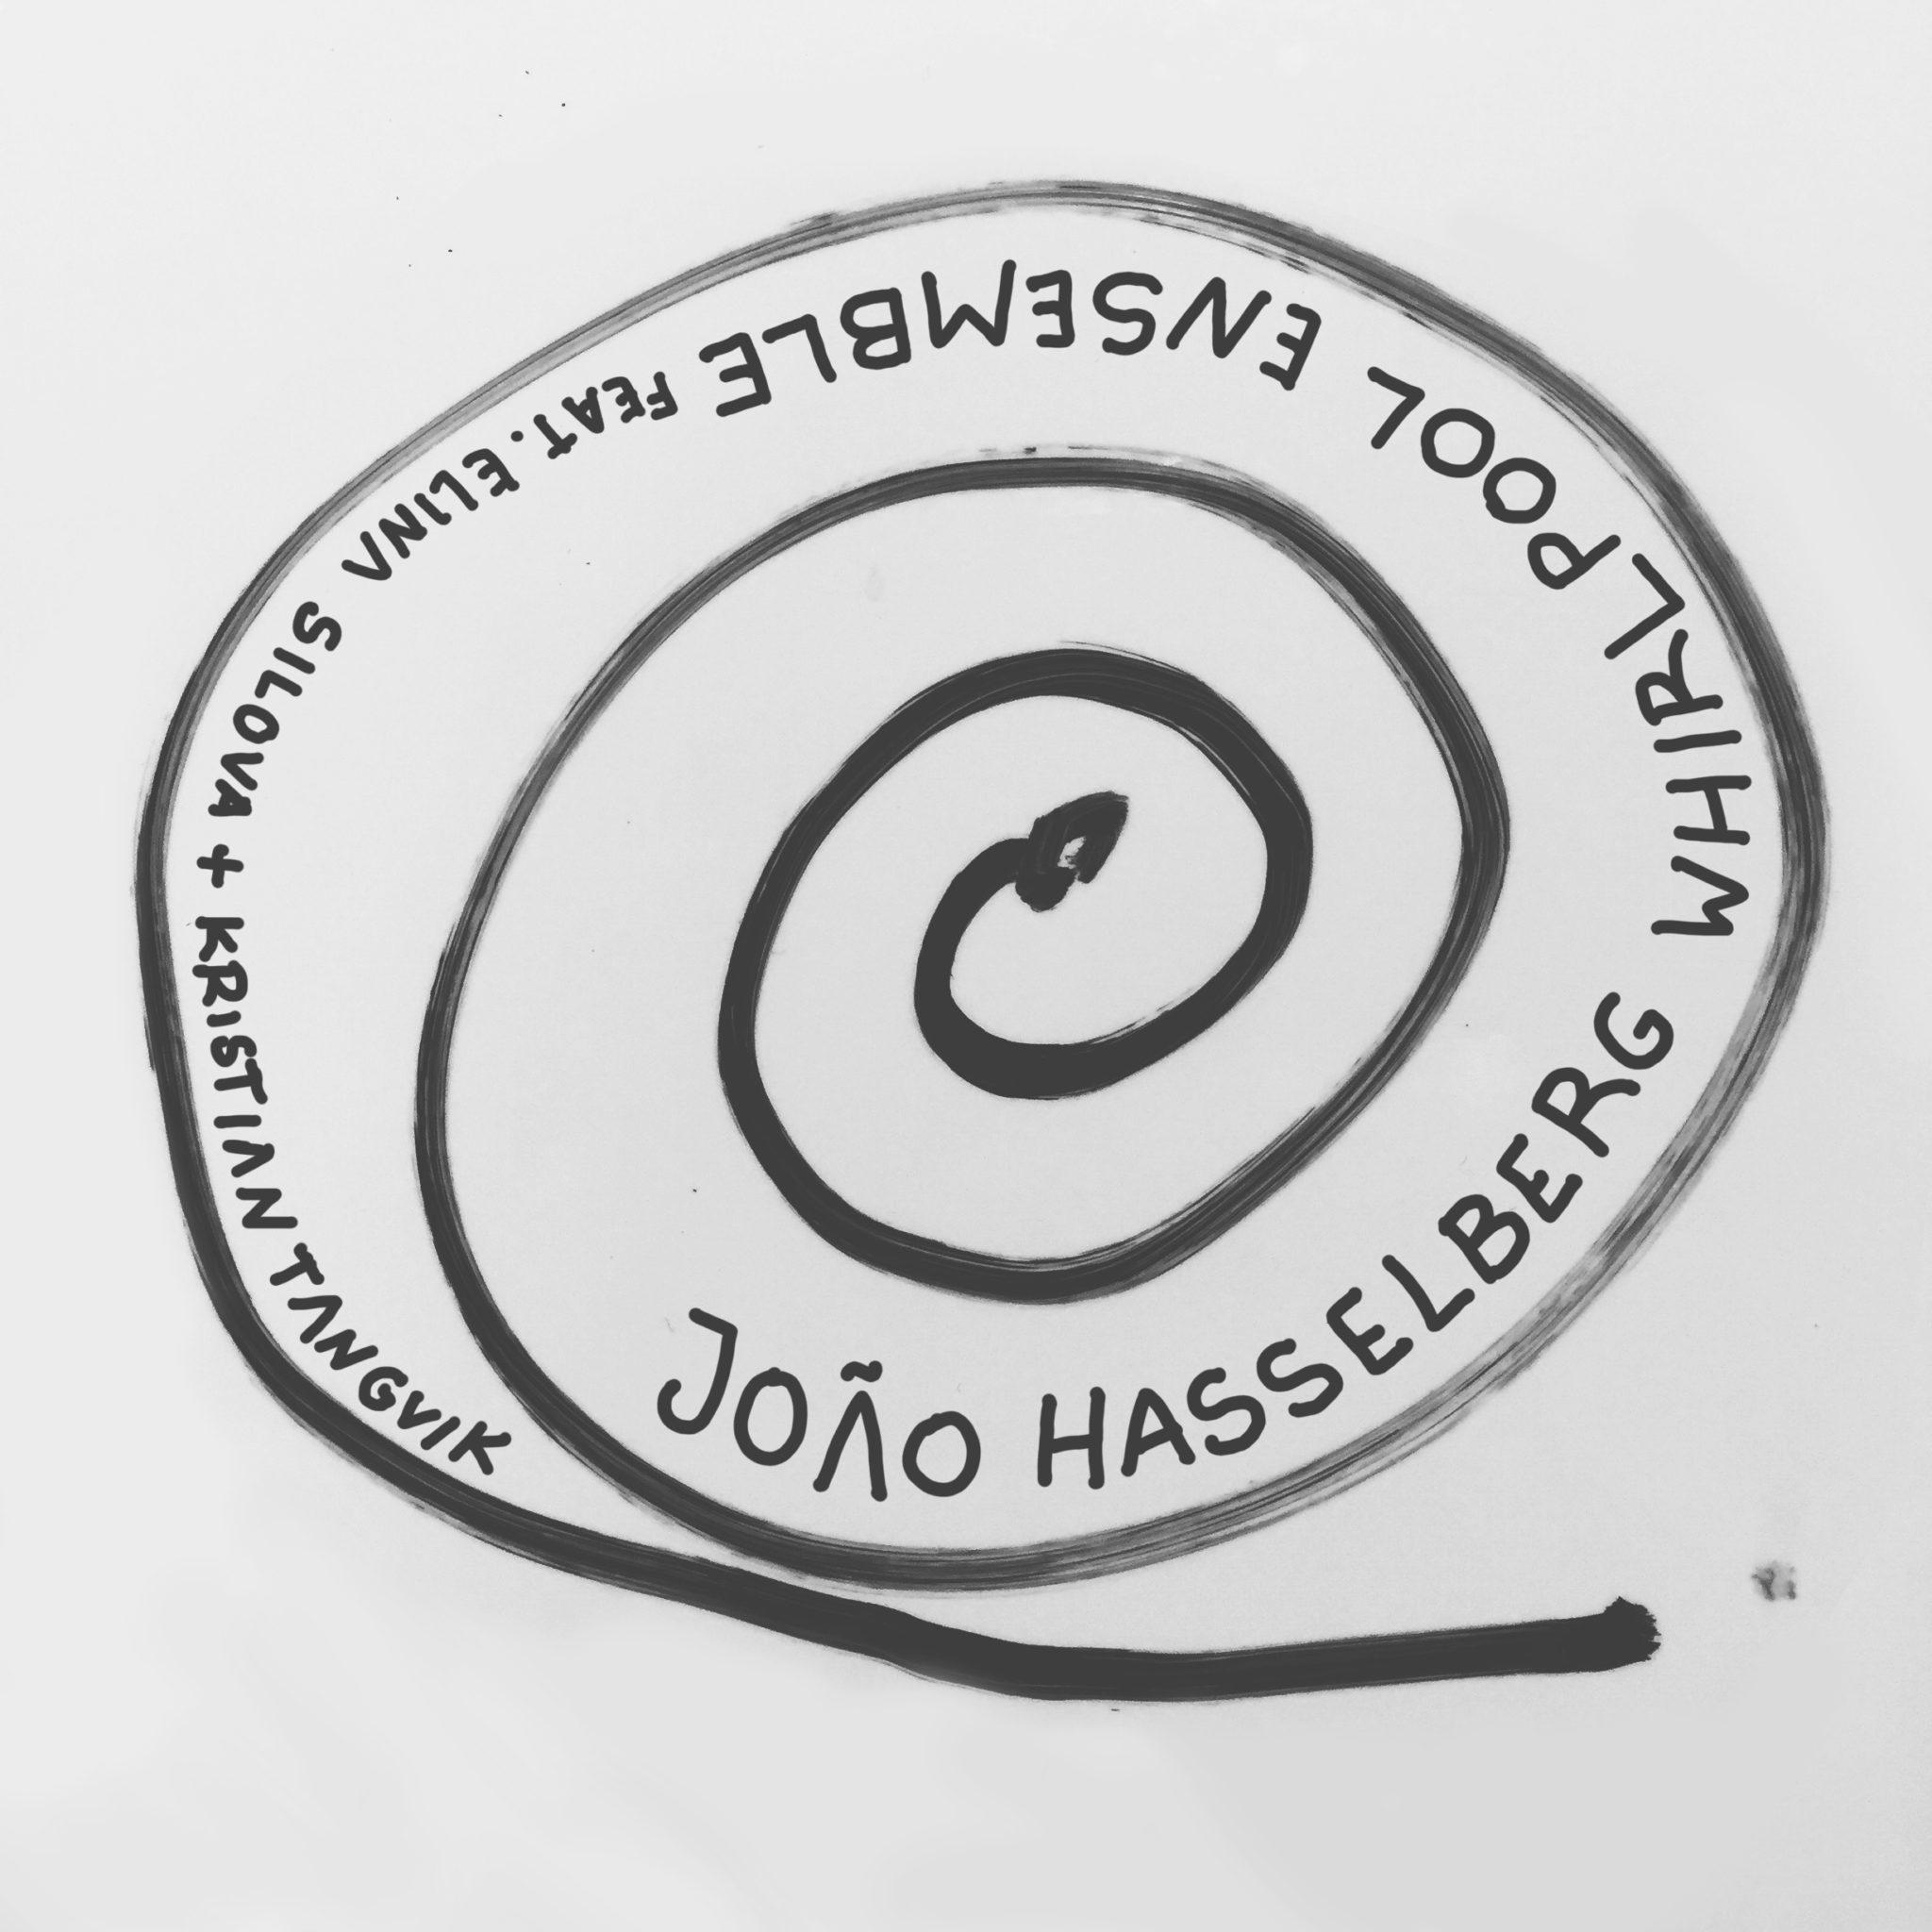 joao-hasselberg-whirlpool-ensemble_